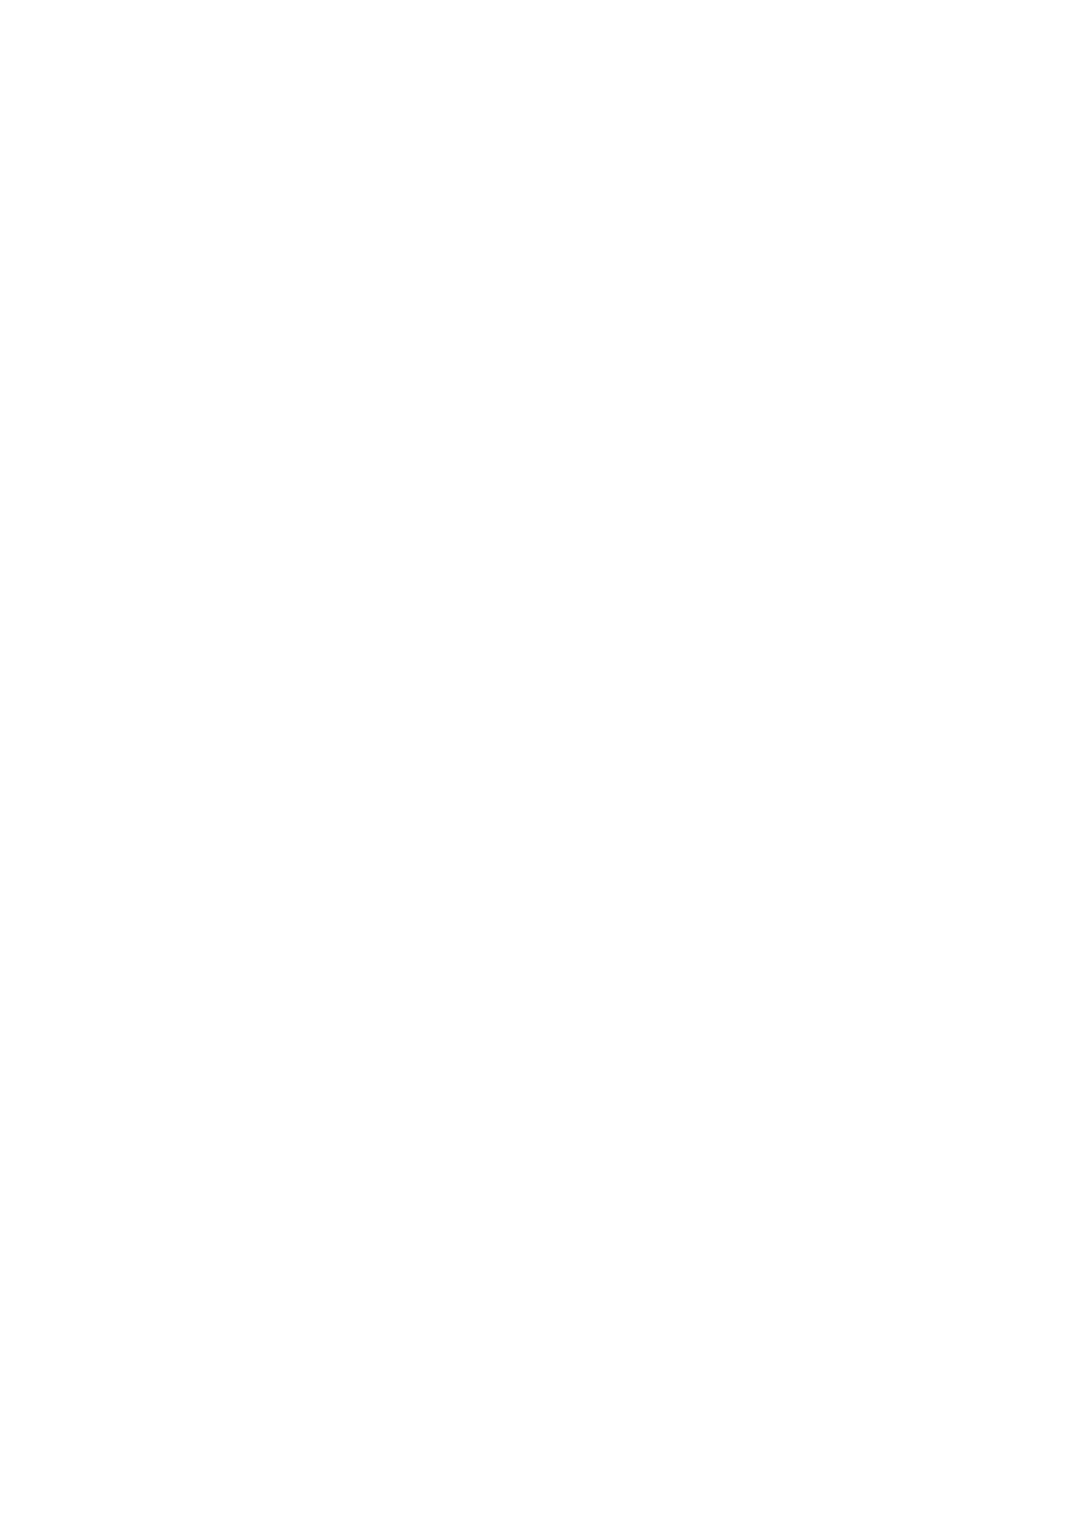 [Macxe's (monmon)] Tokubousentai Dinaranger ~Heroine Kairaku Sennou Keikaku~ Vol.01/02/03 (Renkaban) [Digital] 33